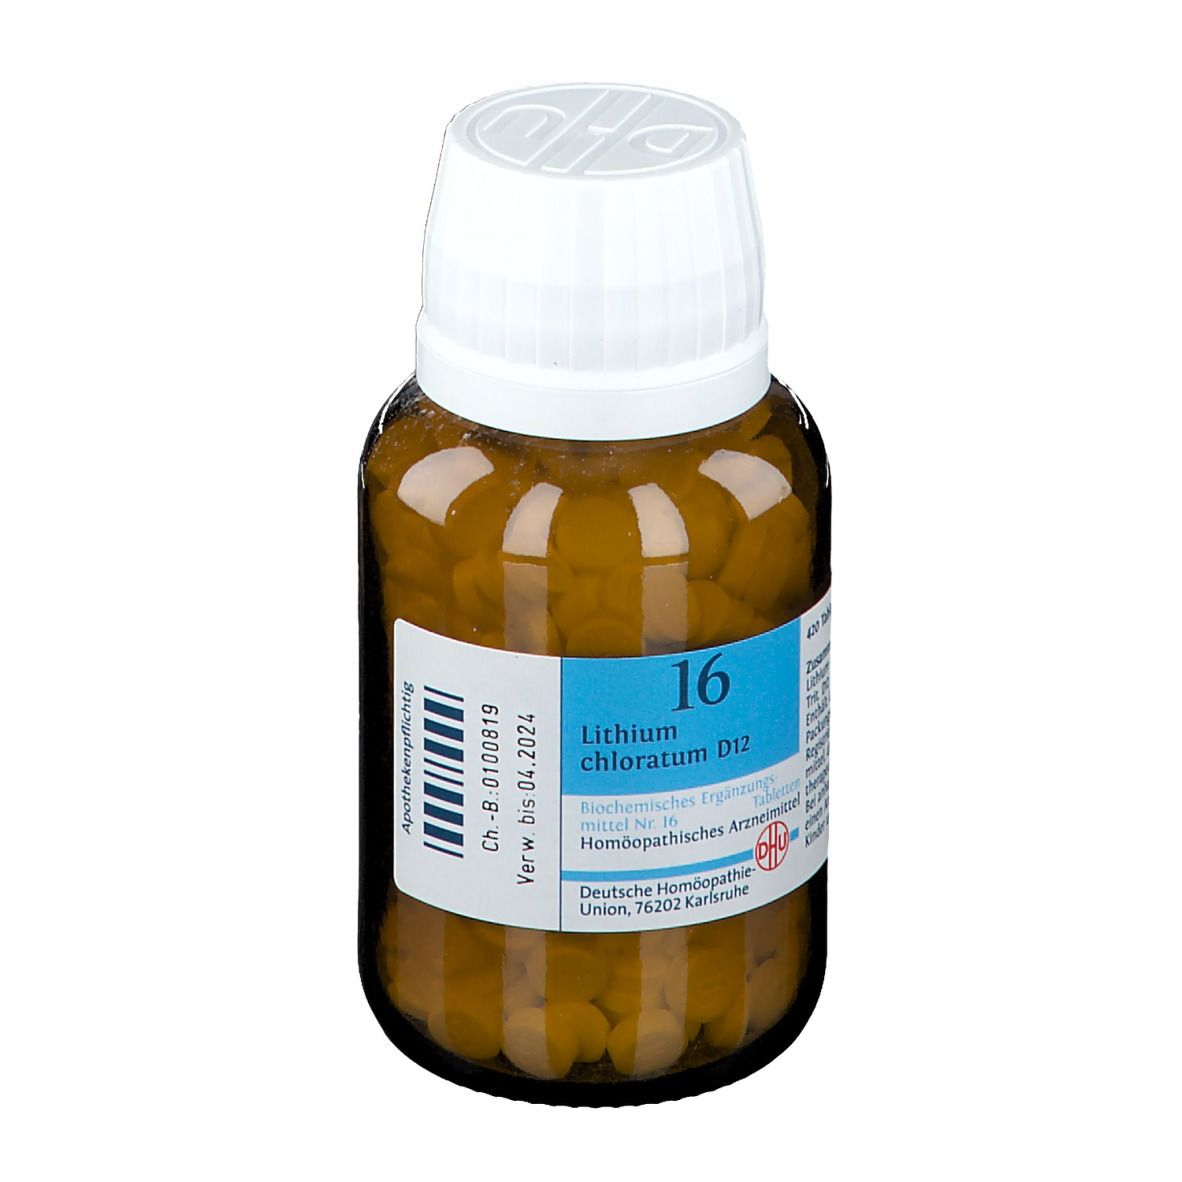 DHU Biochemie 16 Lithium chloratum D12